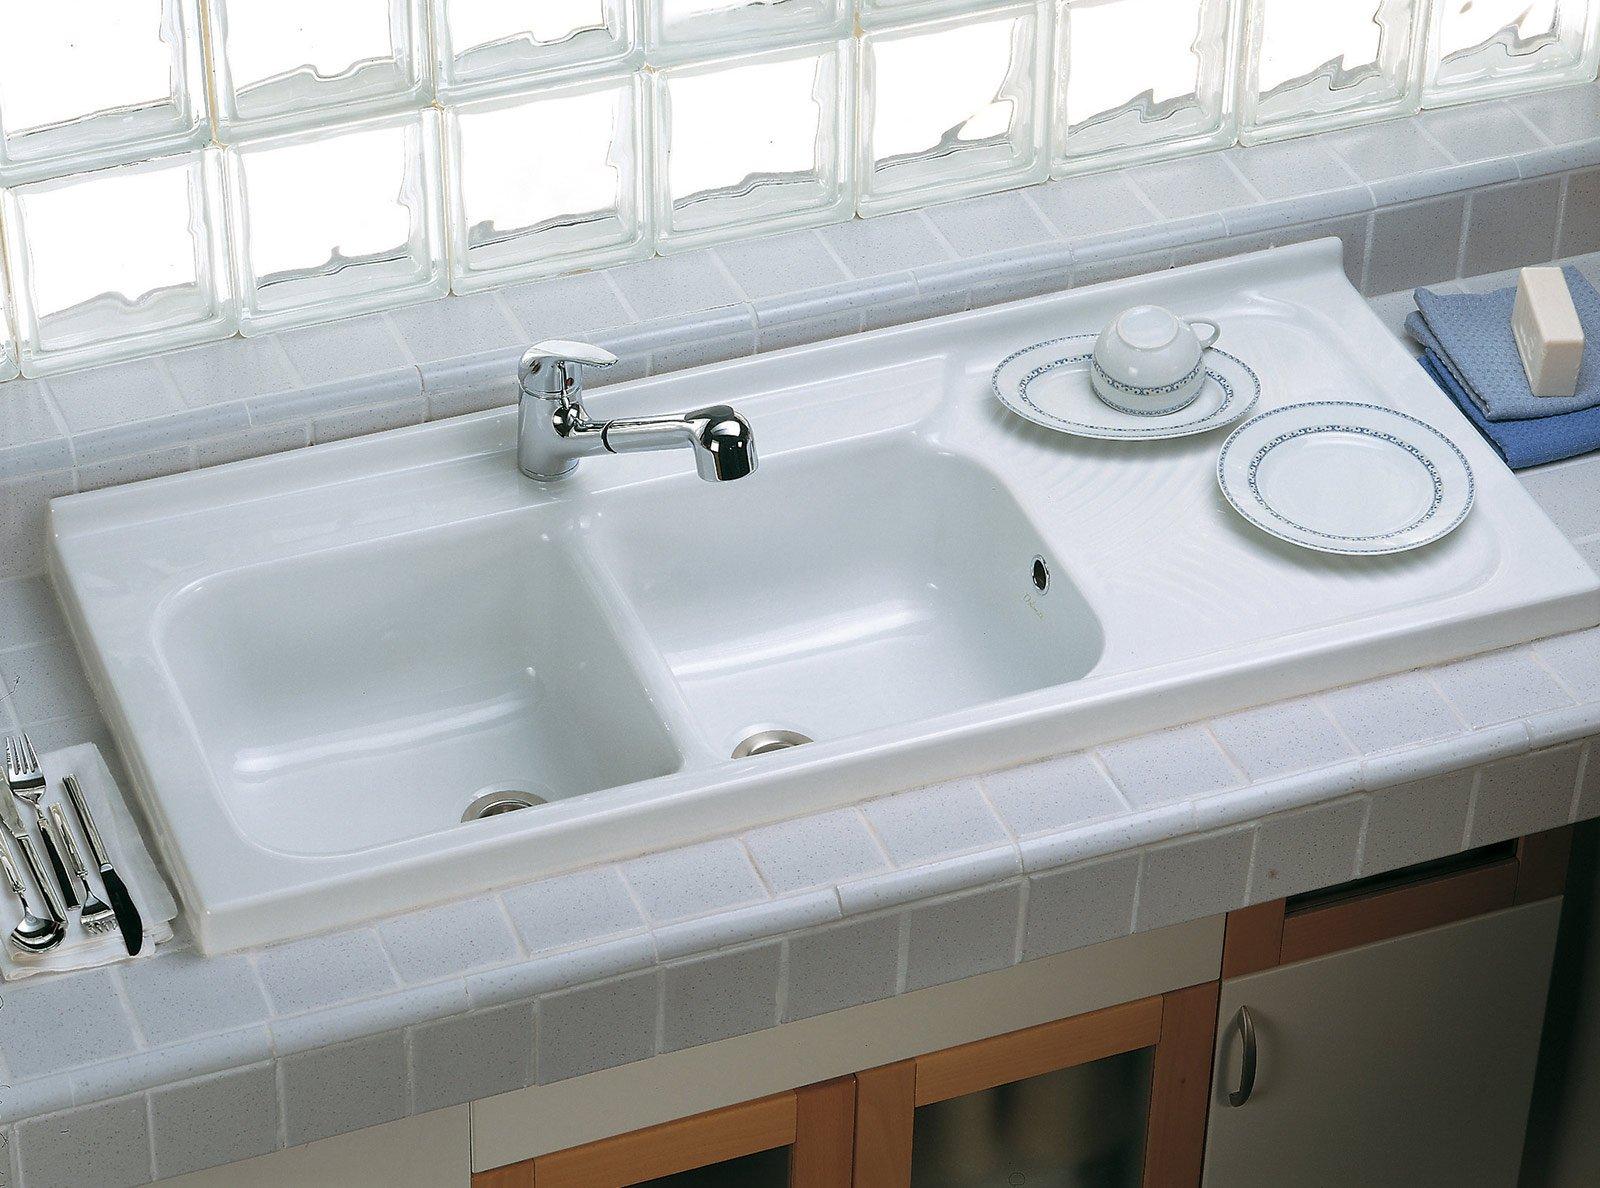 Mobili per lavelli da cucina design casa creativa e mobili ispiratori Lavelli cucina in ceramica